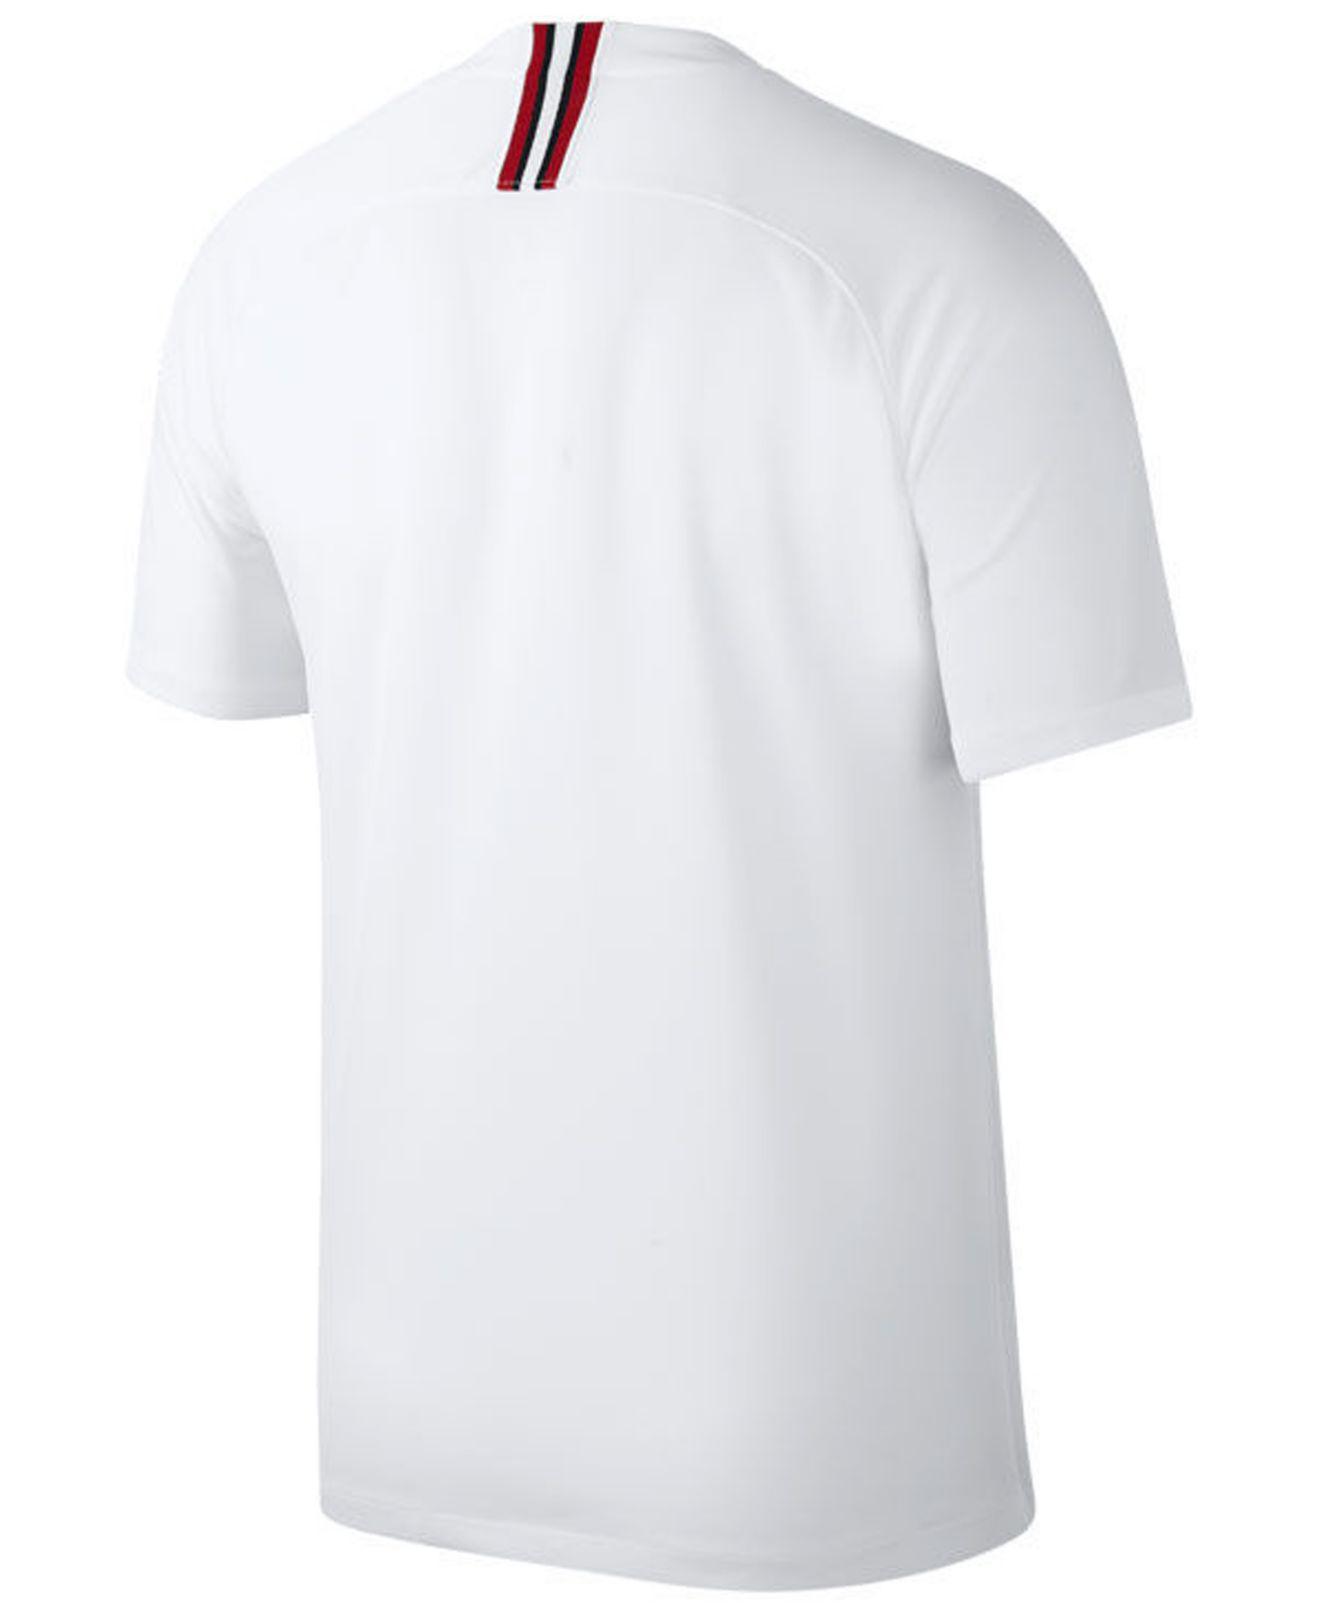 9fd7afce0a4d3 Lyst - Nike Paris Saint-germain International Club 3rd Jersey in White for  Men